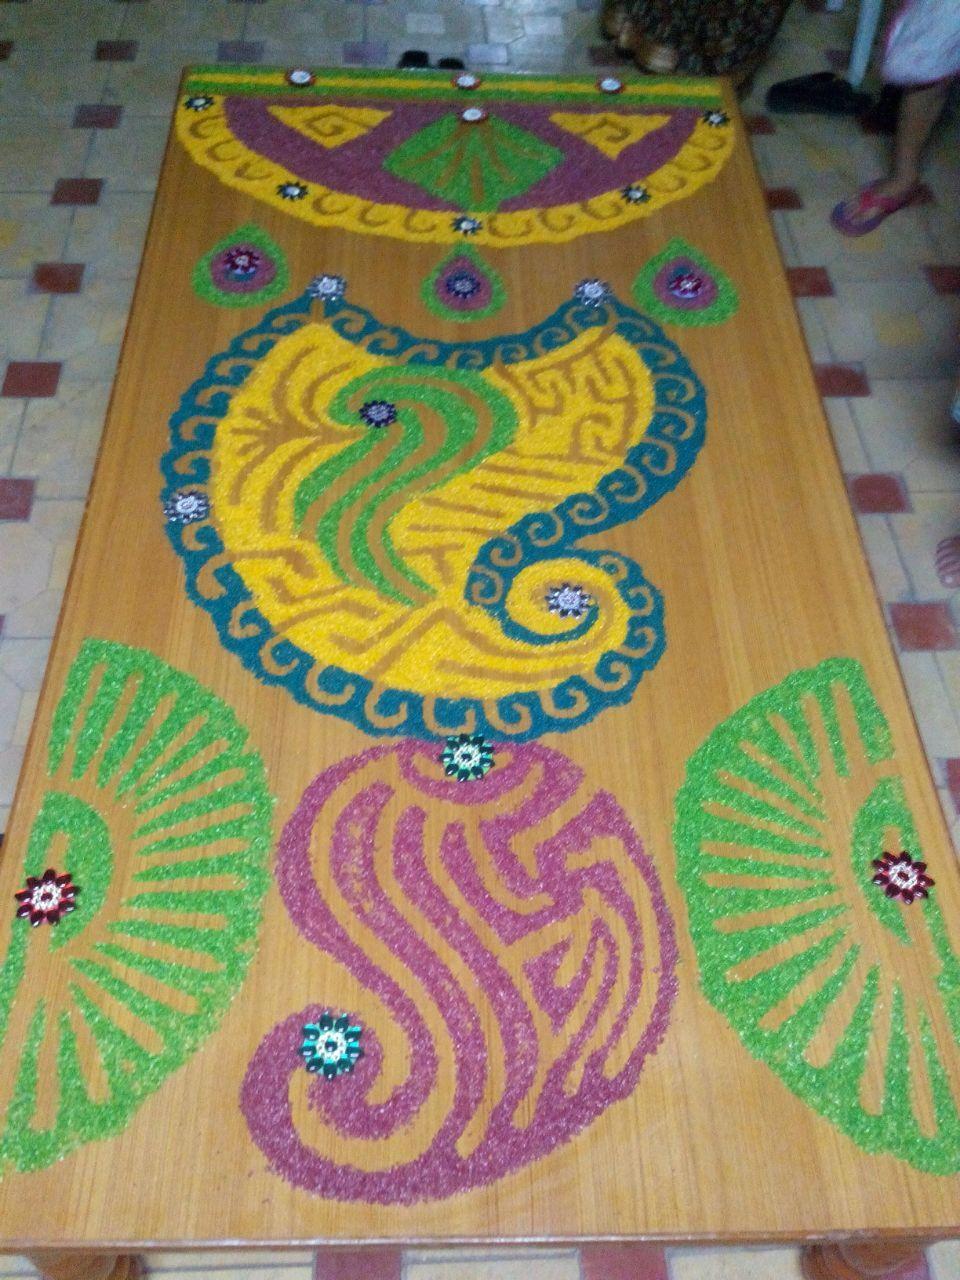 180 carpet shop LL at Bhoomi Castle link road opp Goregaon Sport Club @ 53 packg nego  #HiteshEstate 9820637517